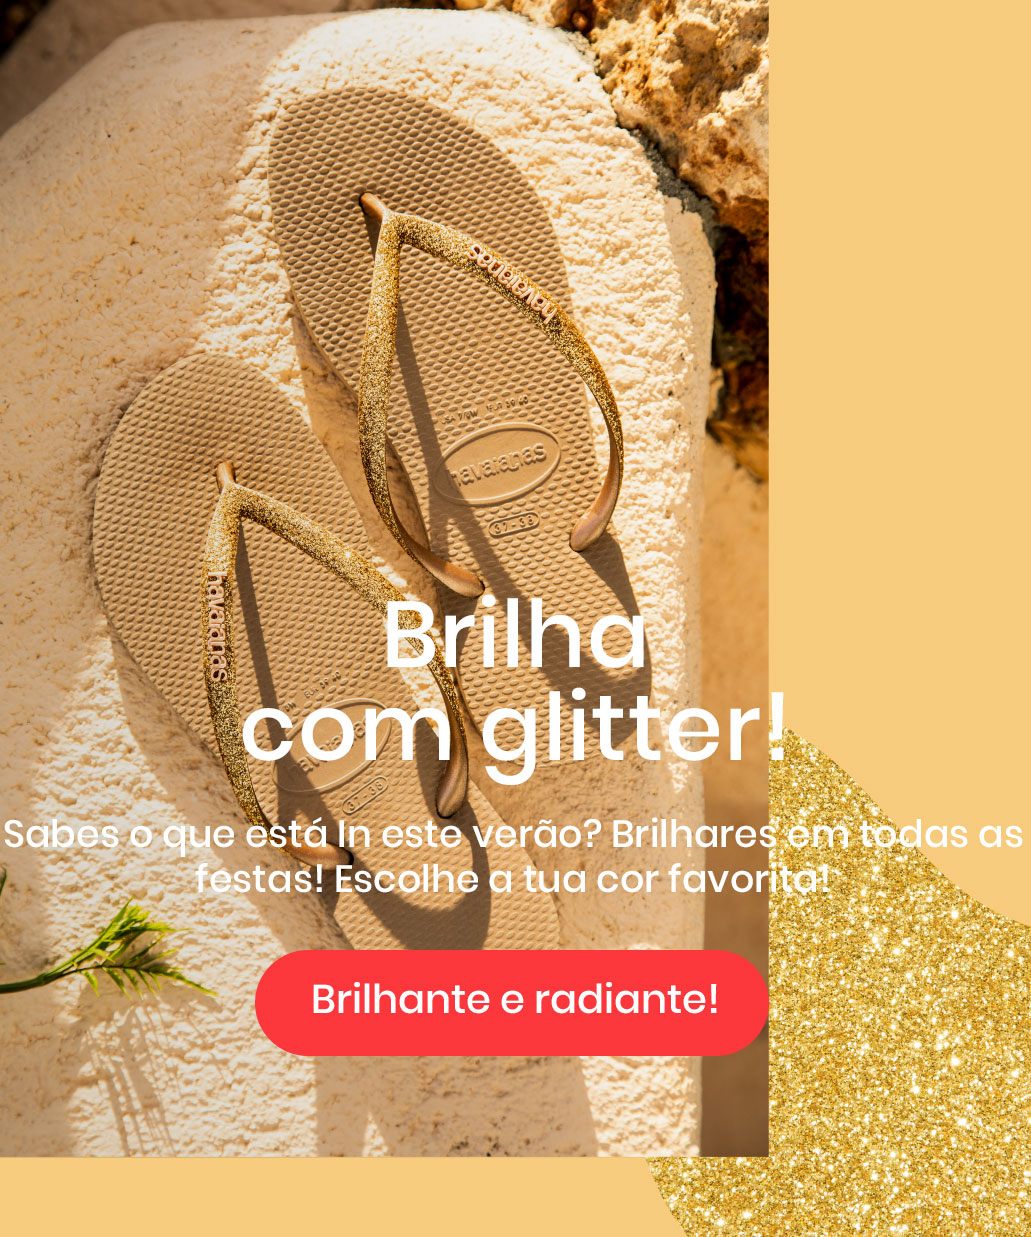 79ee26961 Chinelos Havaianas   Sua loja online Havaianas ® Portugal